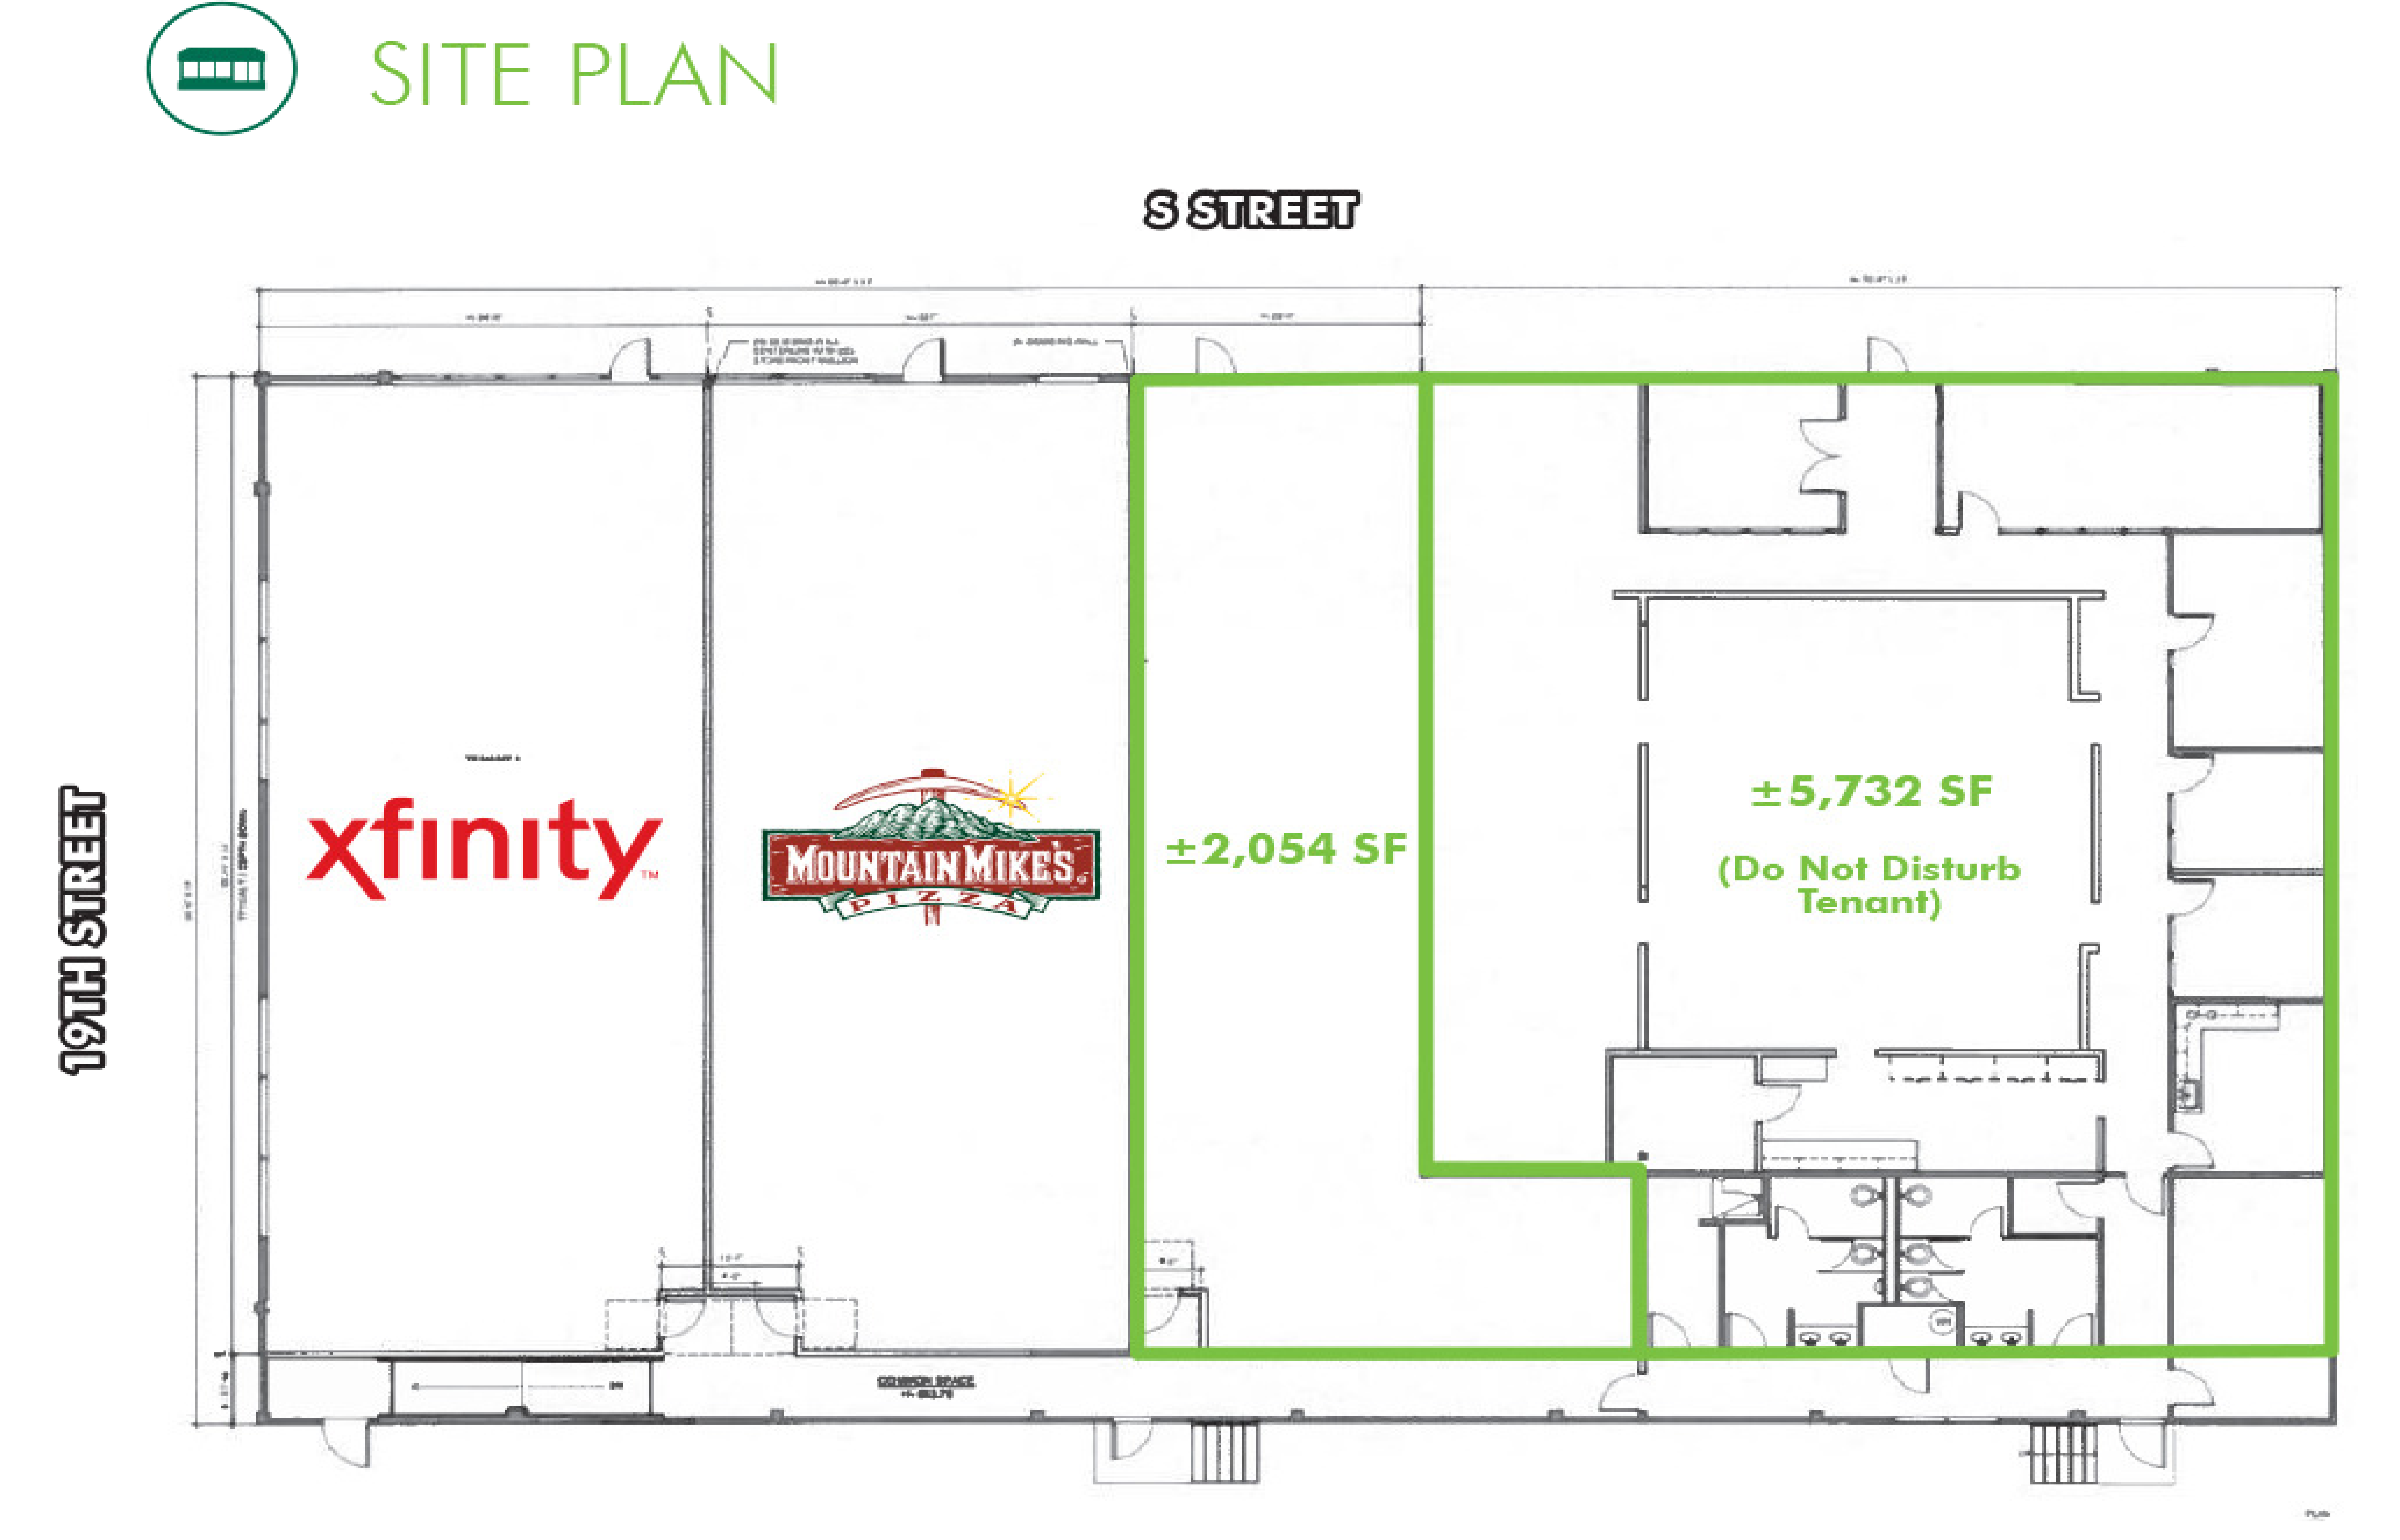 Historic Midtown Building: site plan